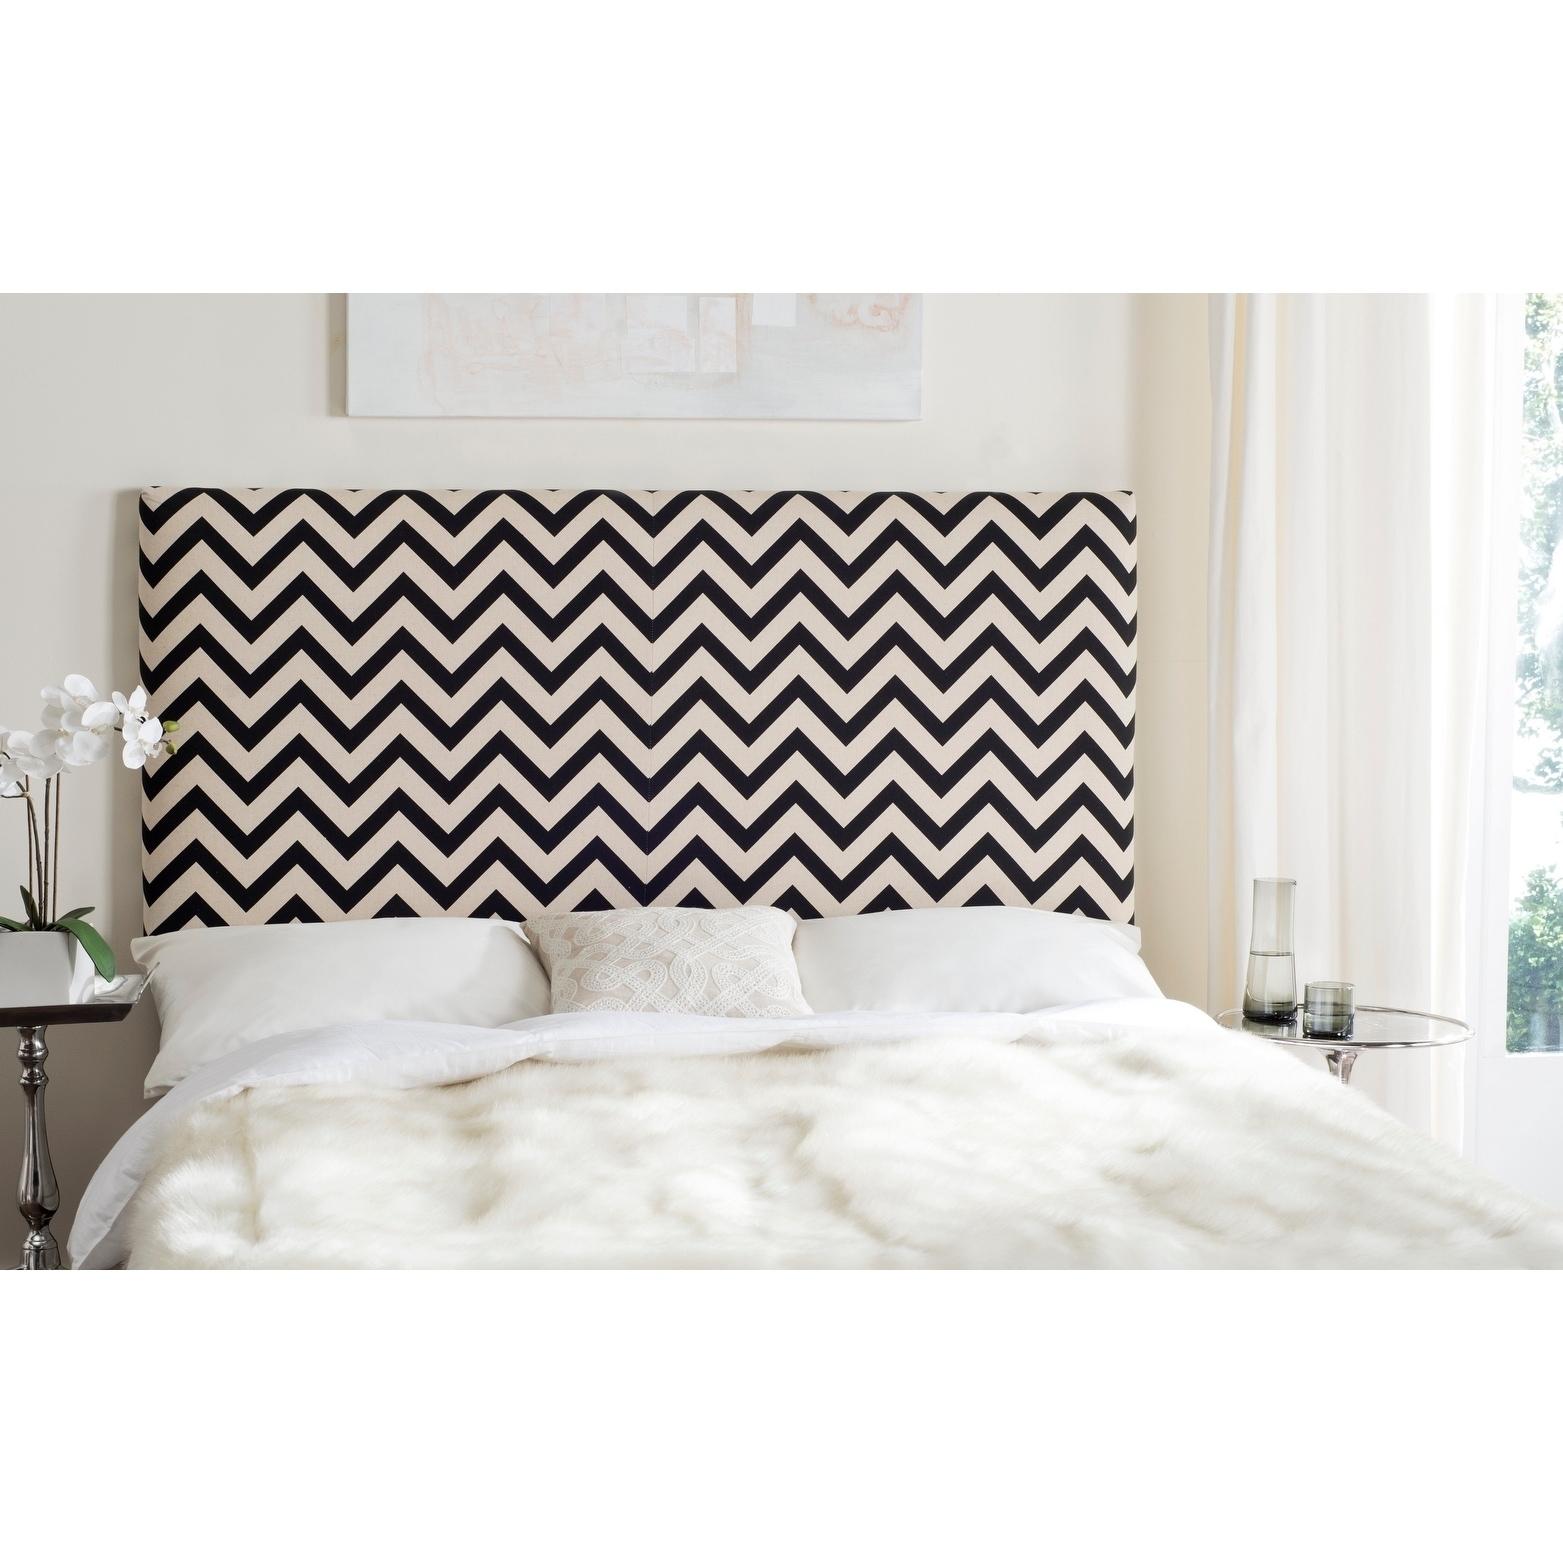 Shop Black Friday Deals On Safavieh Ziggy Black White Upholstered Chevron Headboard King Overstock 10329183